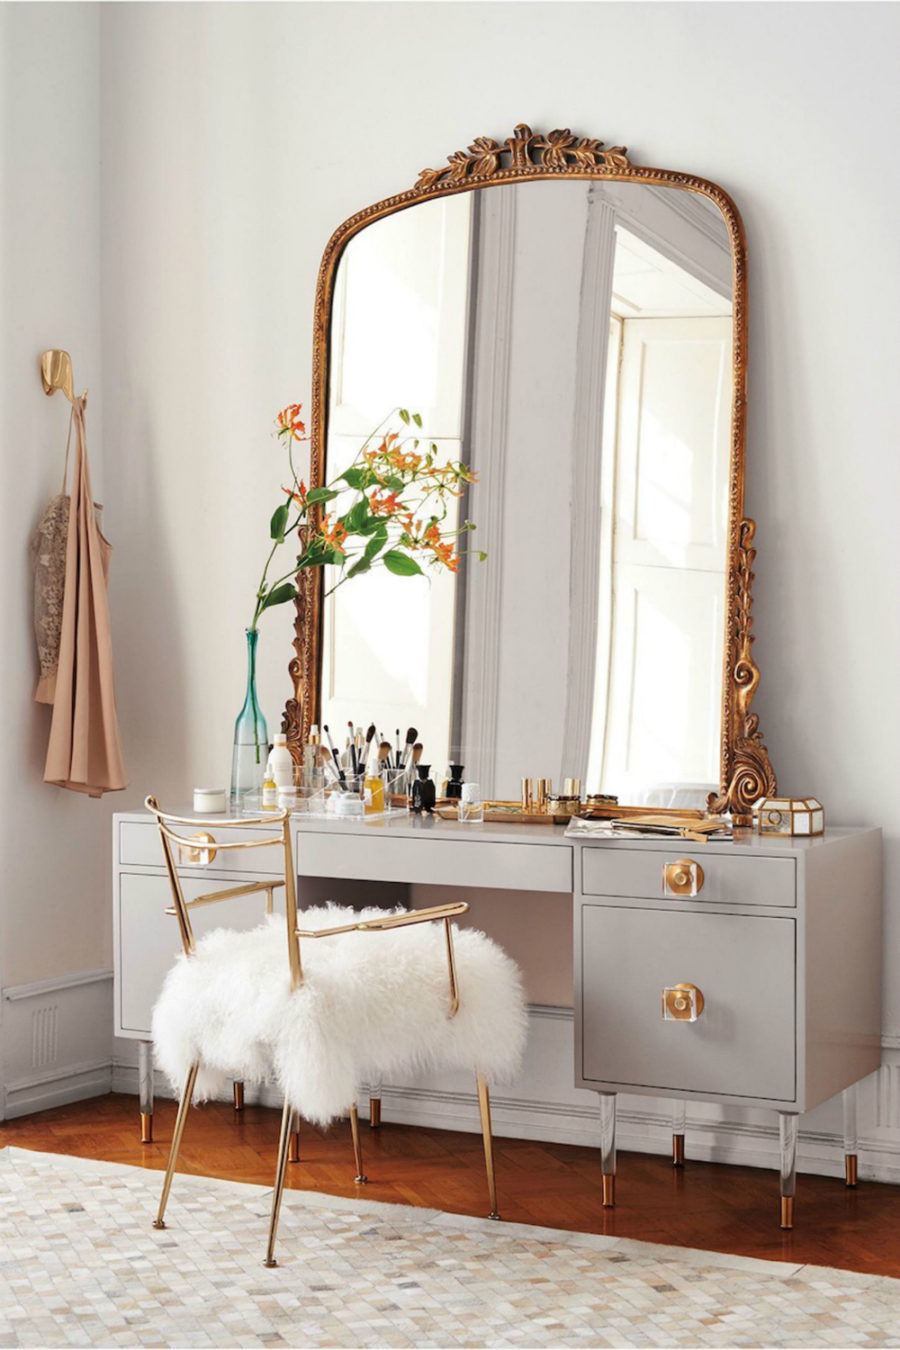 Fancy View in gallery Big mirror